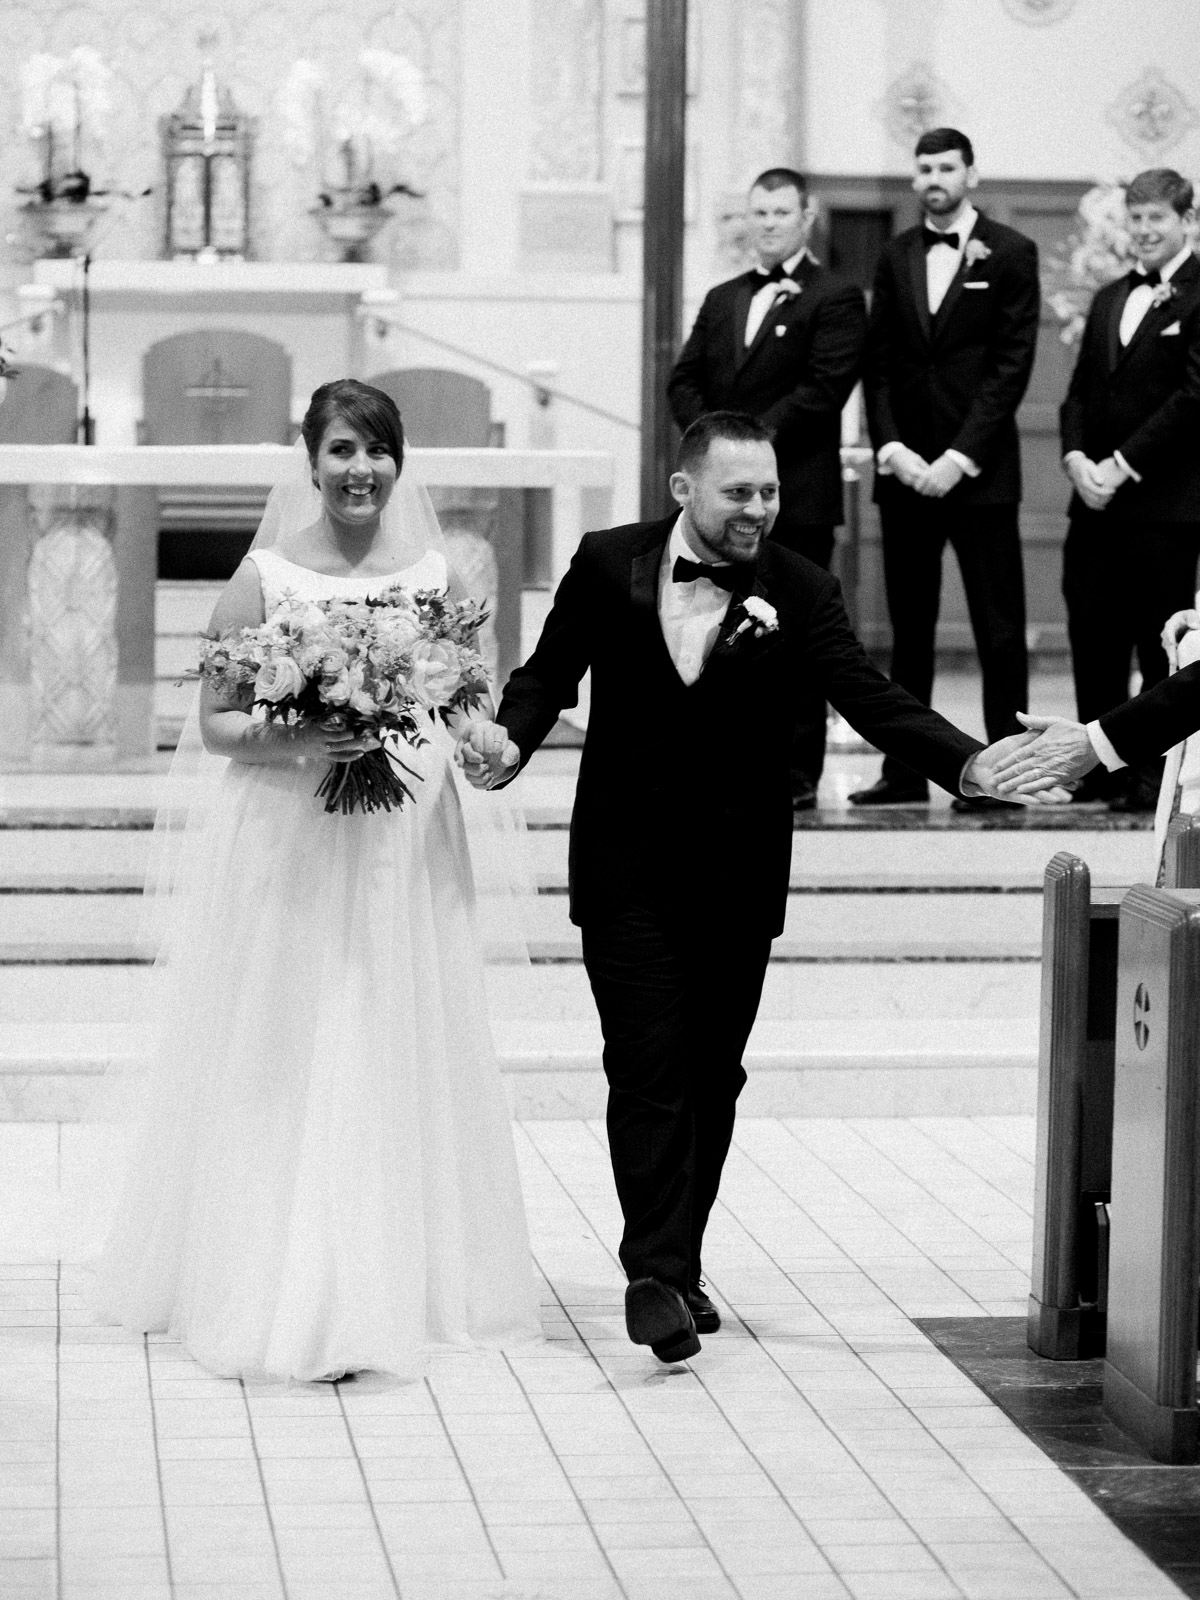 Bright and Joyful Cleveland Wedding Photography at Music Box Supper Club-22.jpg